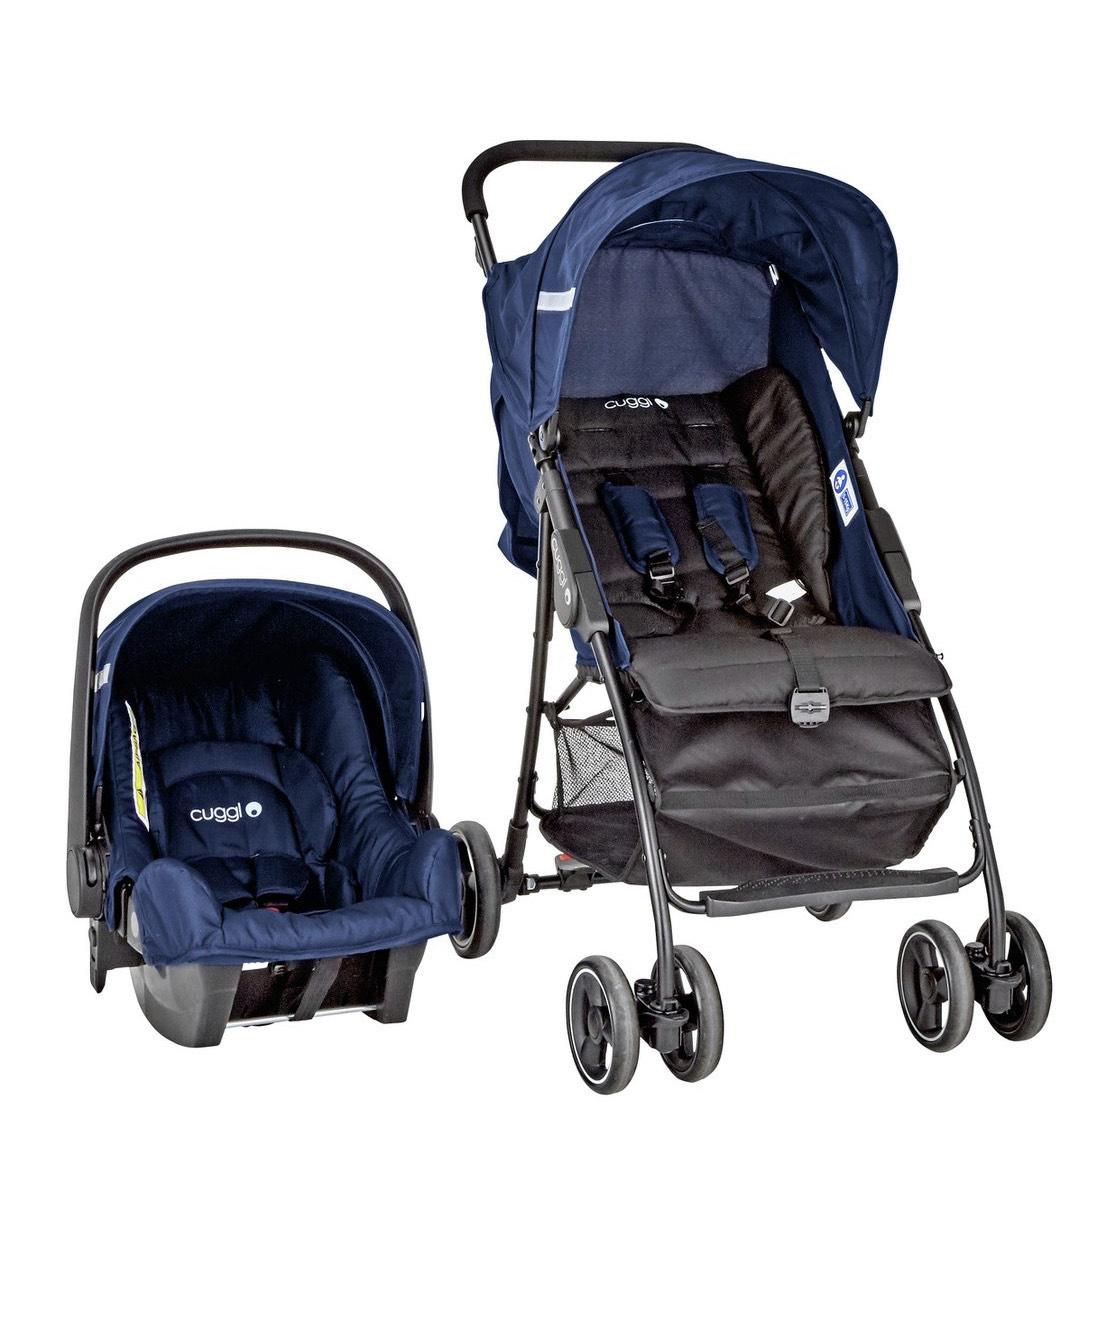 Cuggl Empress Travel System - car seat and stroller £24.99 @ Argos